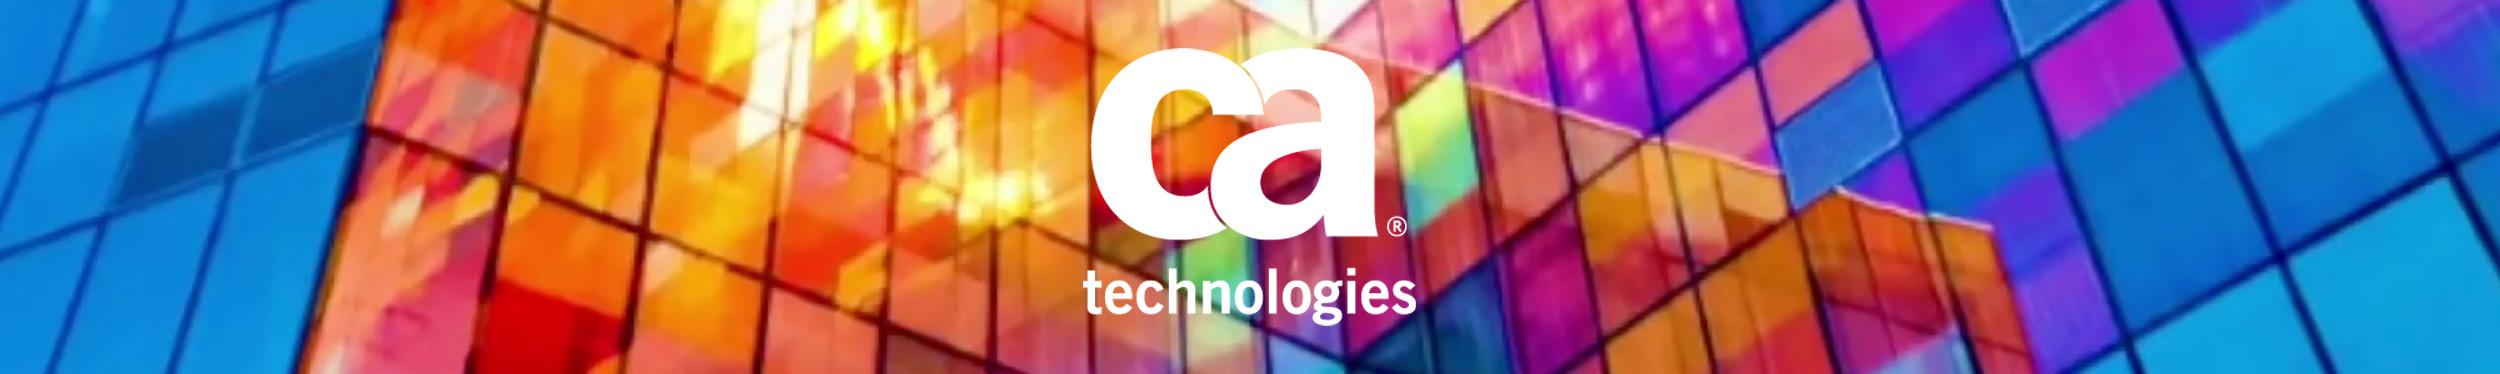 StudioMetria | CA Technologies